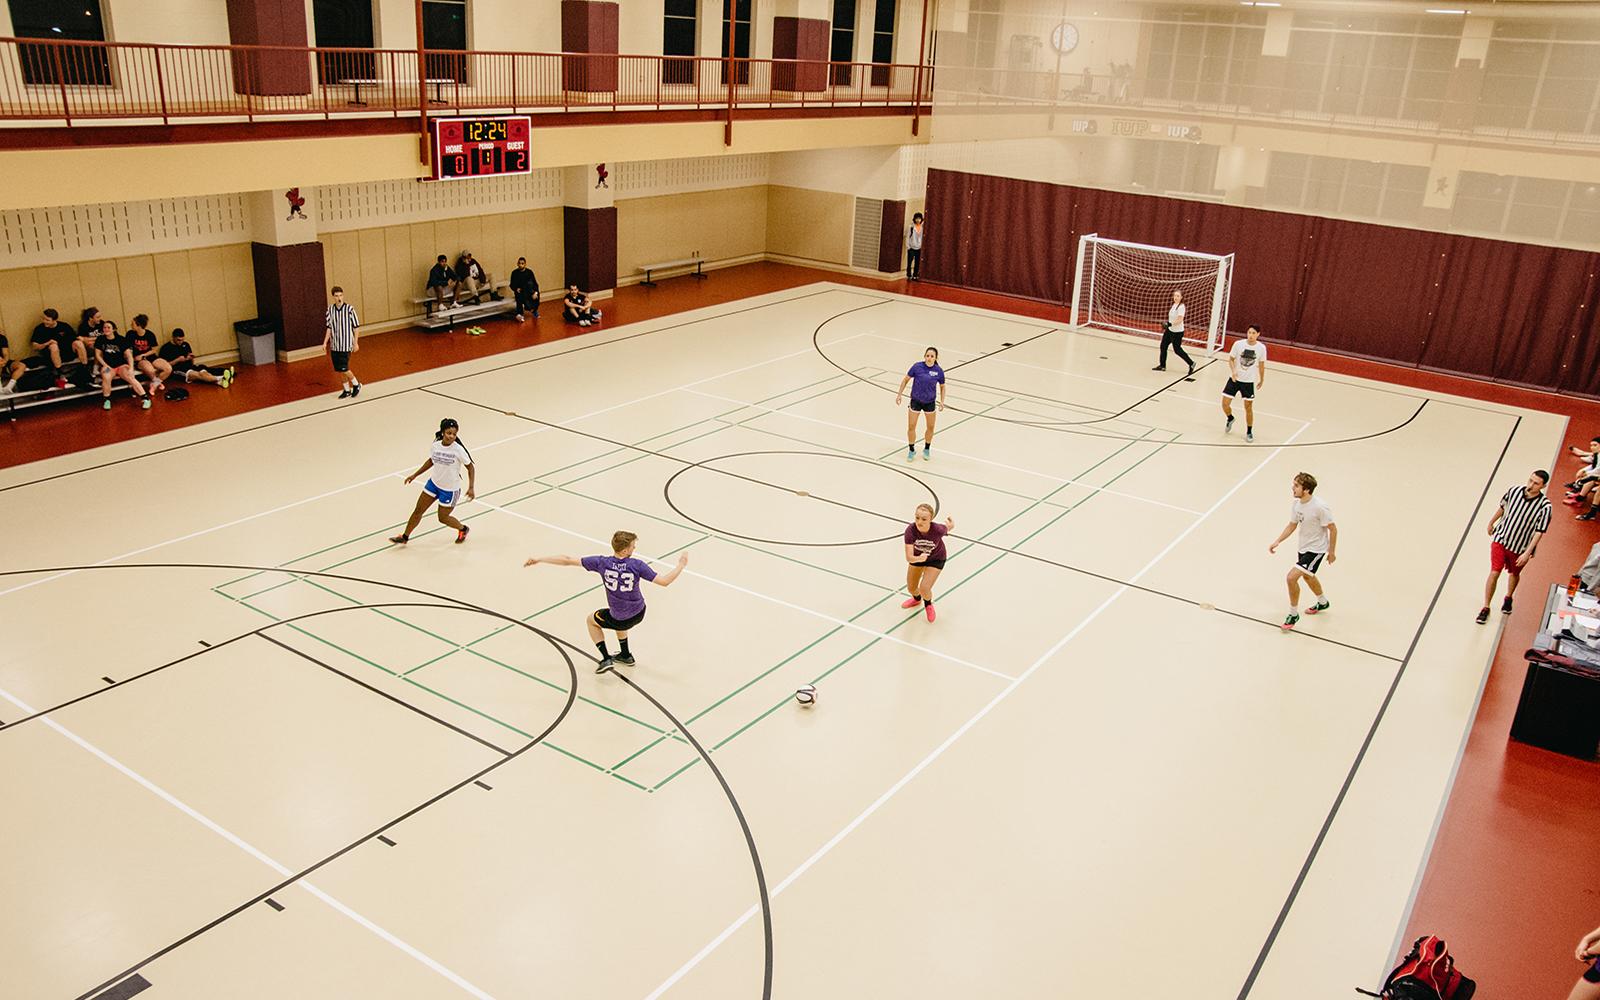 3-on-3 Indoor Soccer